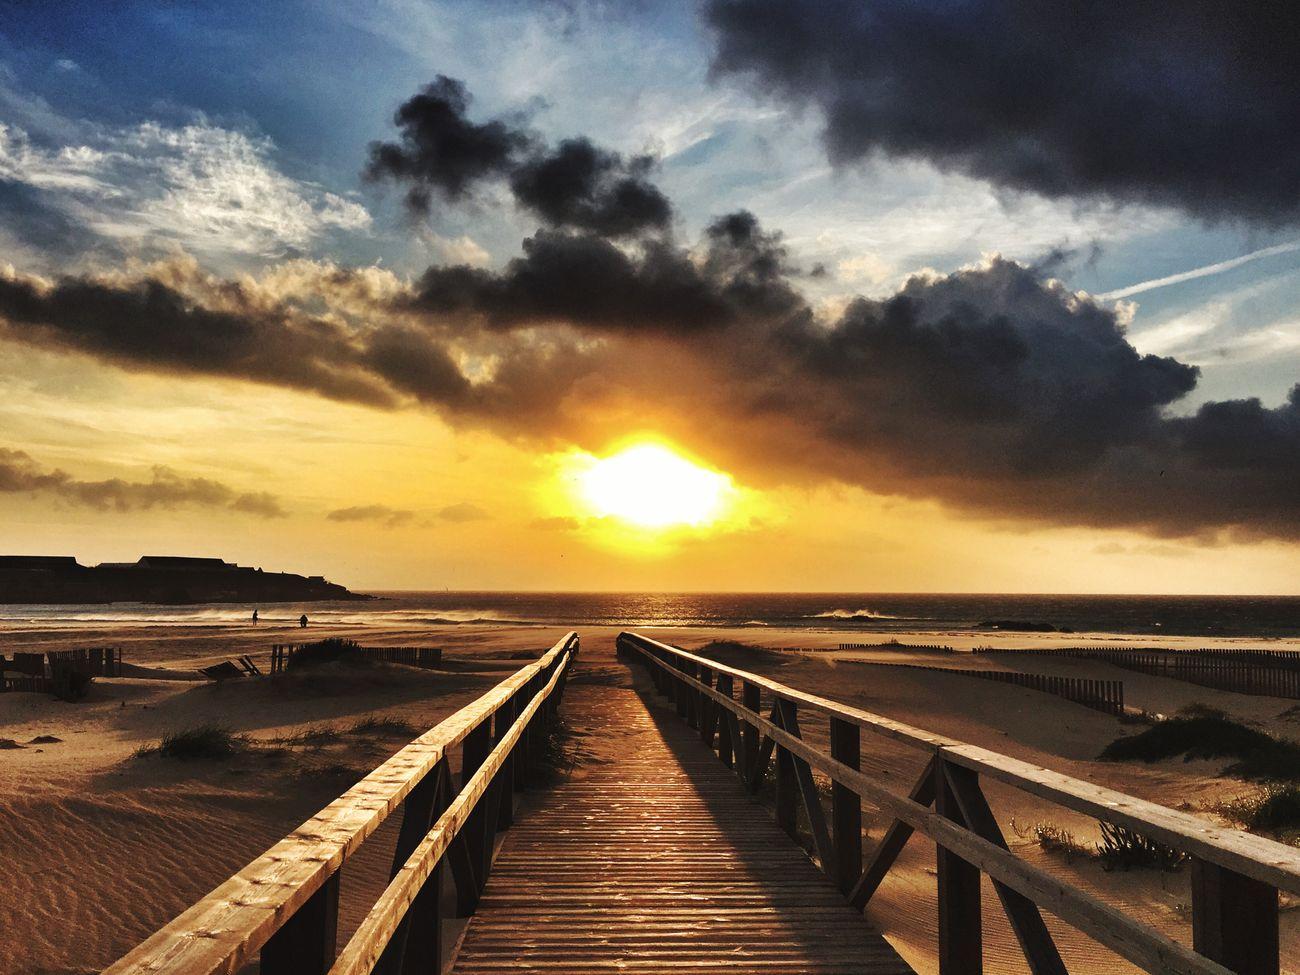 EyeEm Best Shots IPhoneography Sunshine Landscape